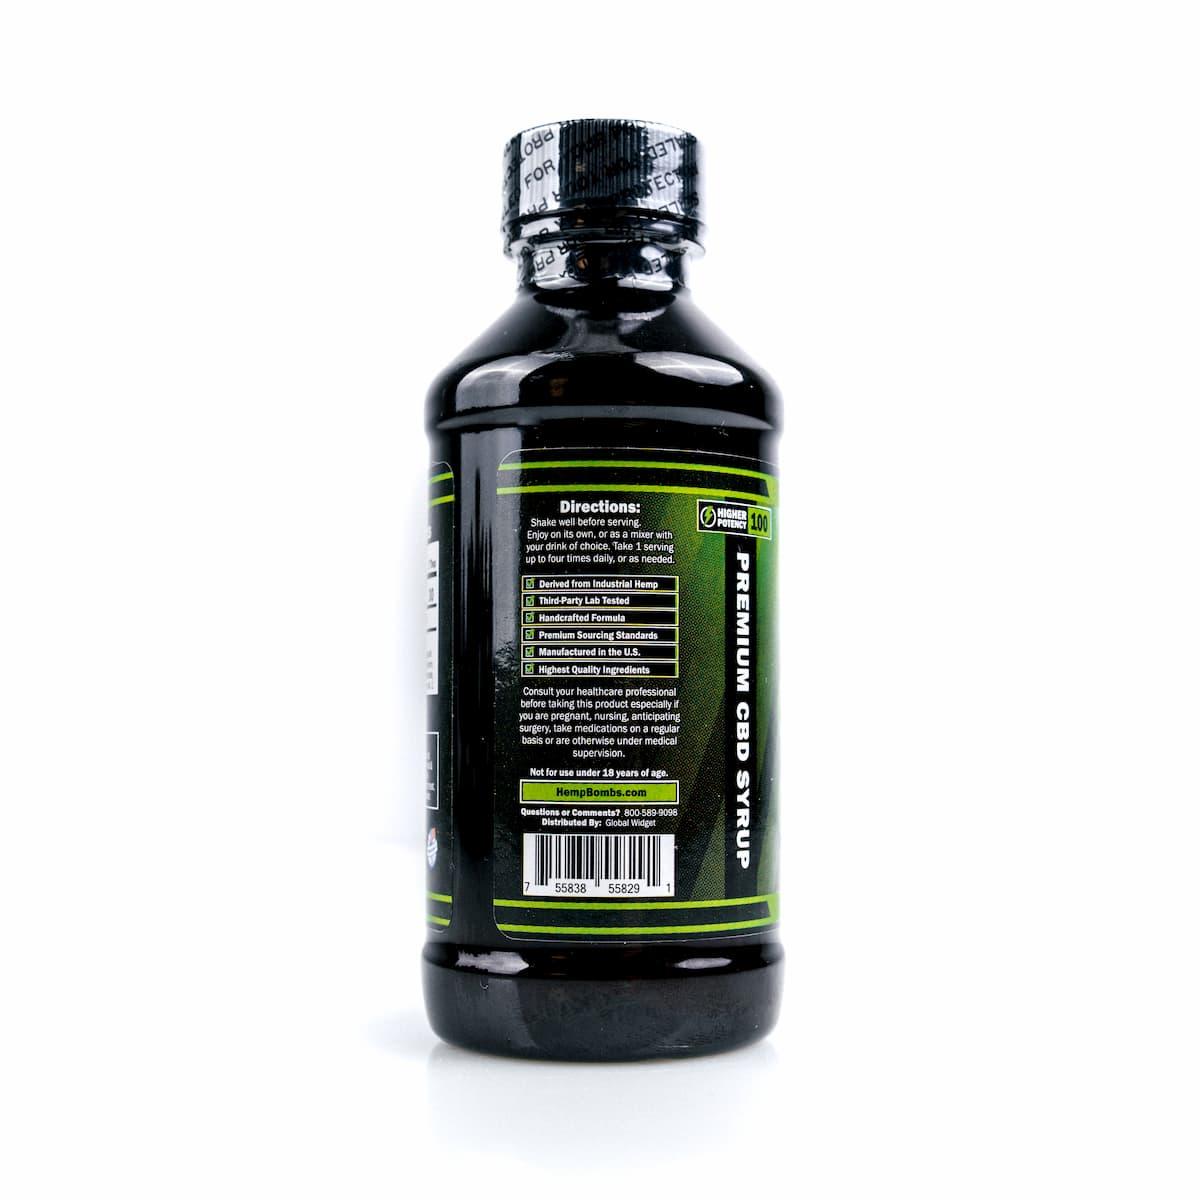 Hemp Bombs, CBD Relaxation Syrup, 4oz, 100mg of CBD 2